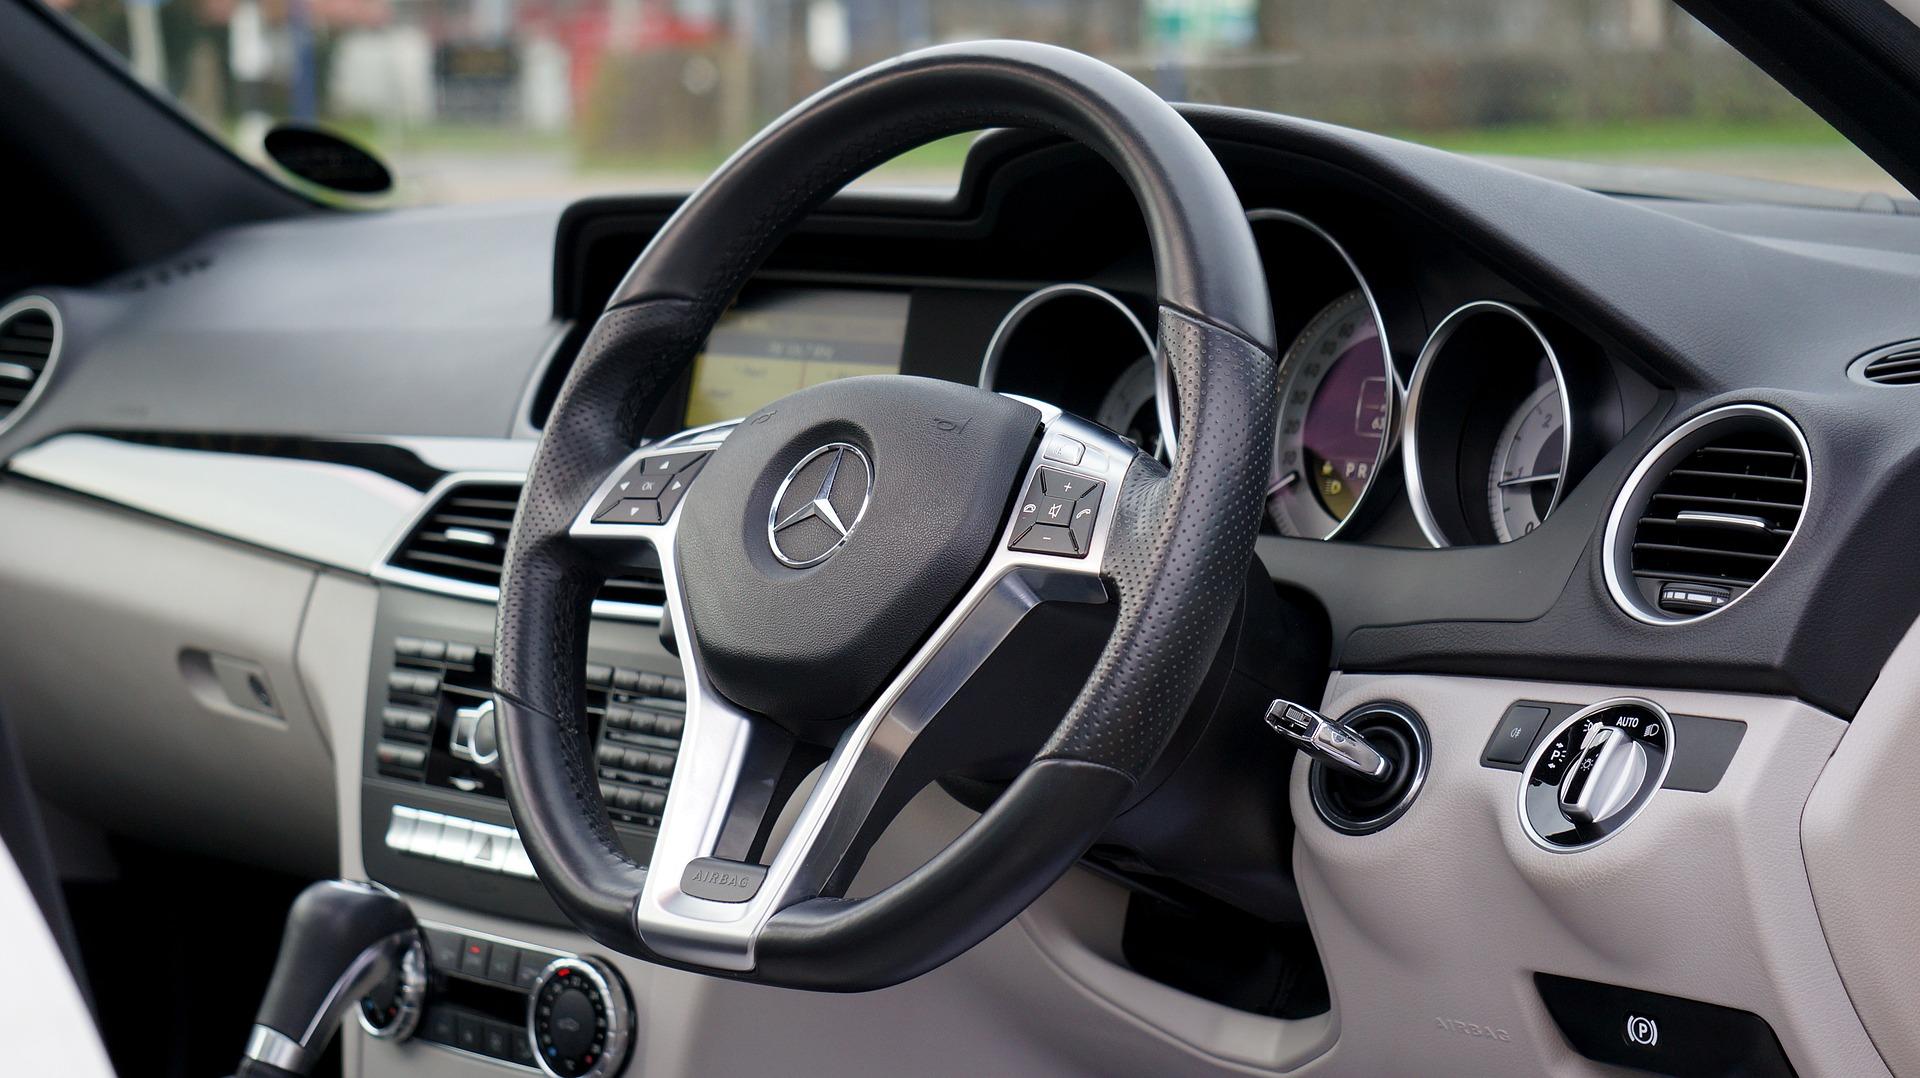 Cost To Paint A Car >> Automotive Plastic Coating for Car Interiors | Coating.com.au